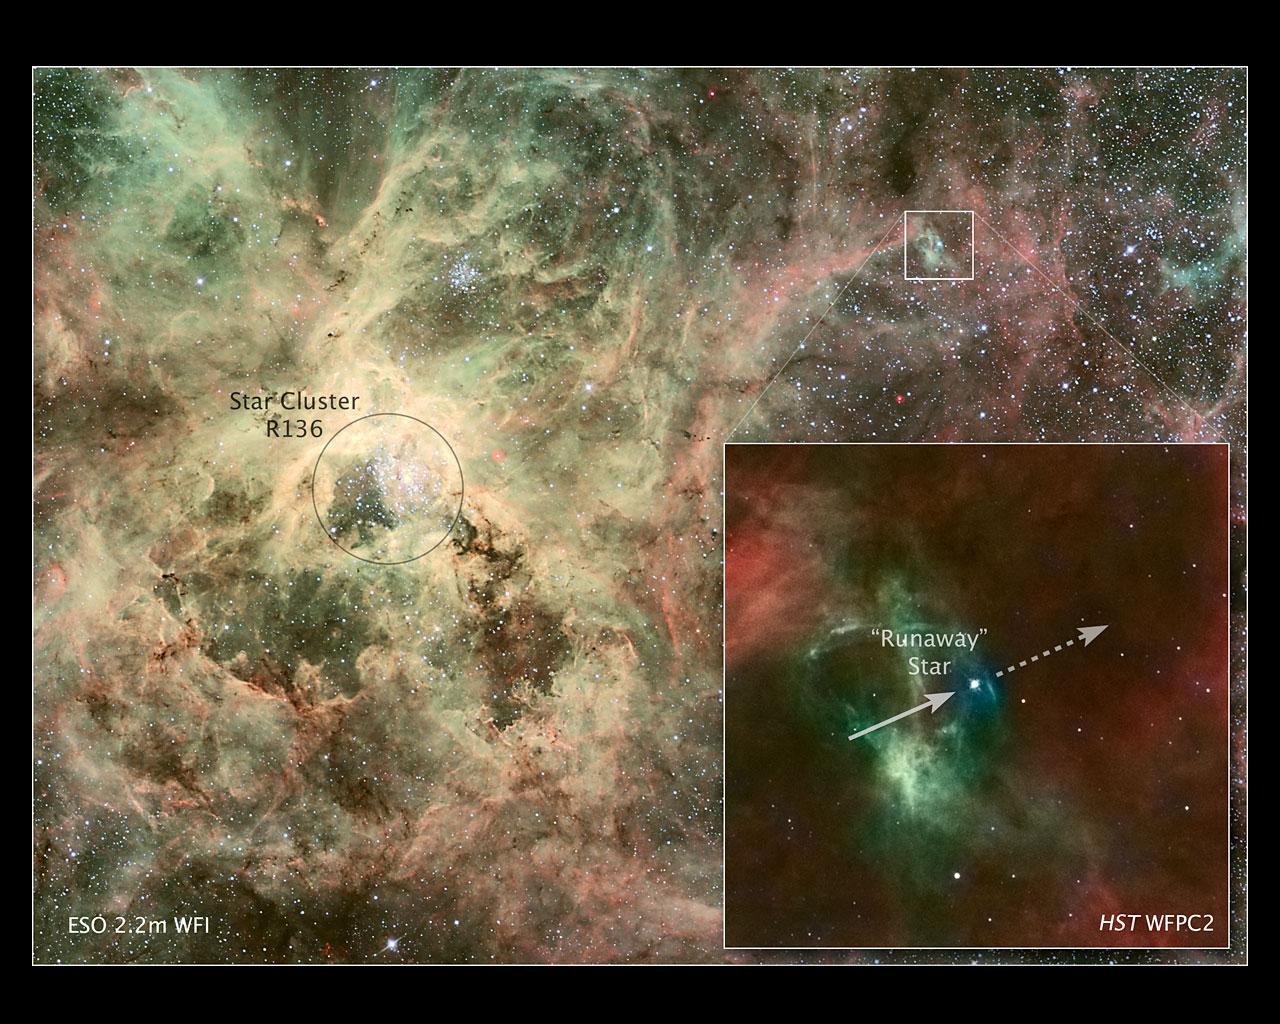 Astronomers nab runaway star